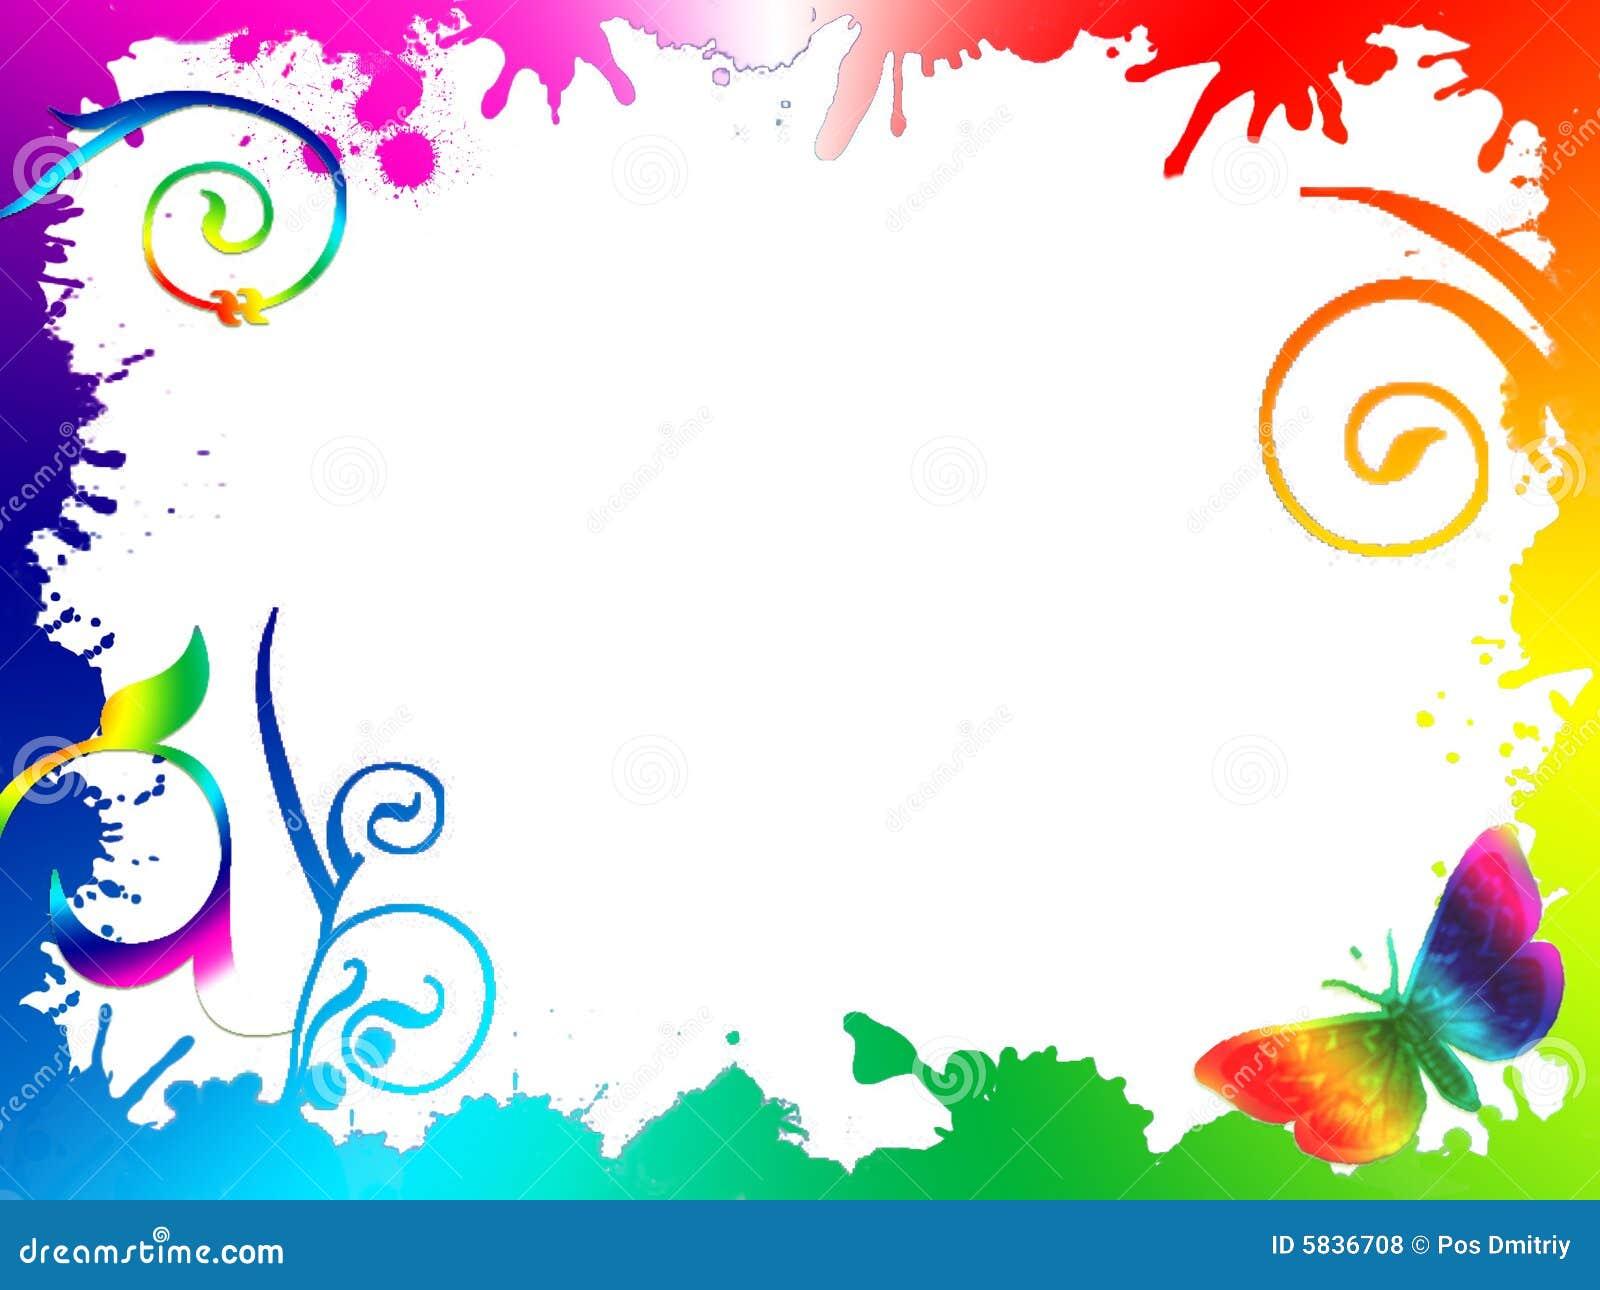 Fondo De Fiesta Diseño Decoracion Confeti Arte Patrón: Summed Leafs Rainbow Background Stock Illustration